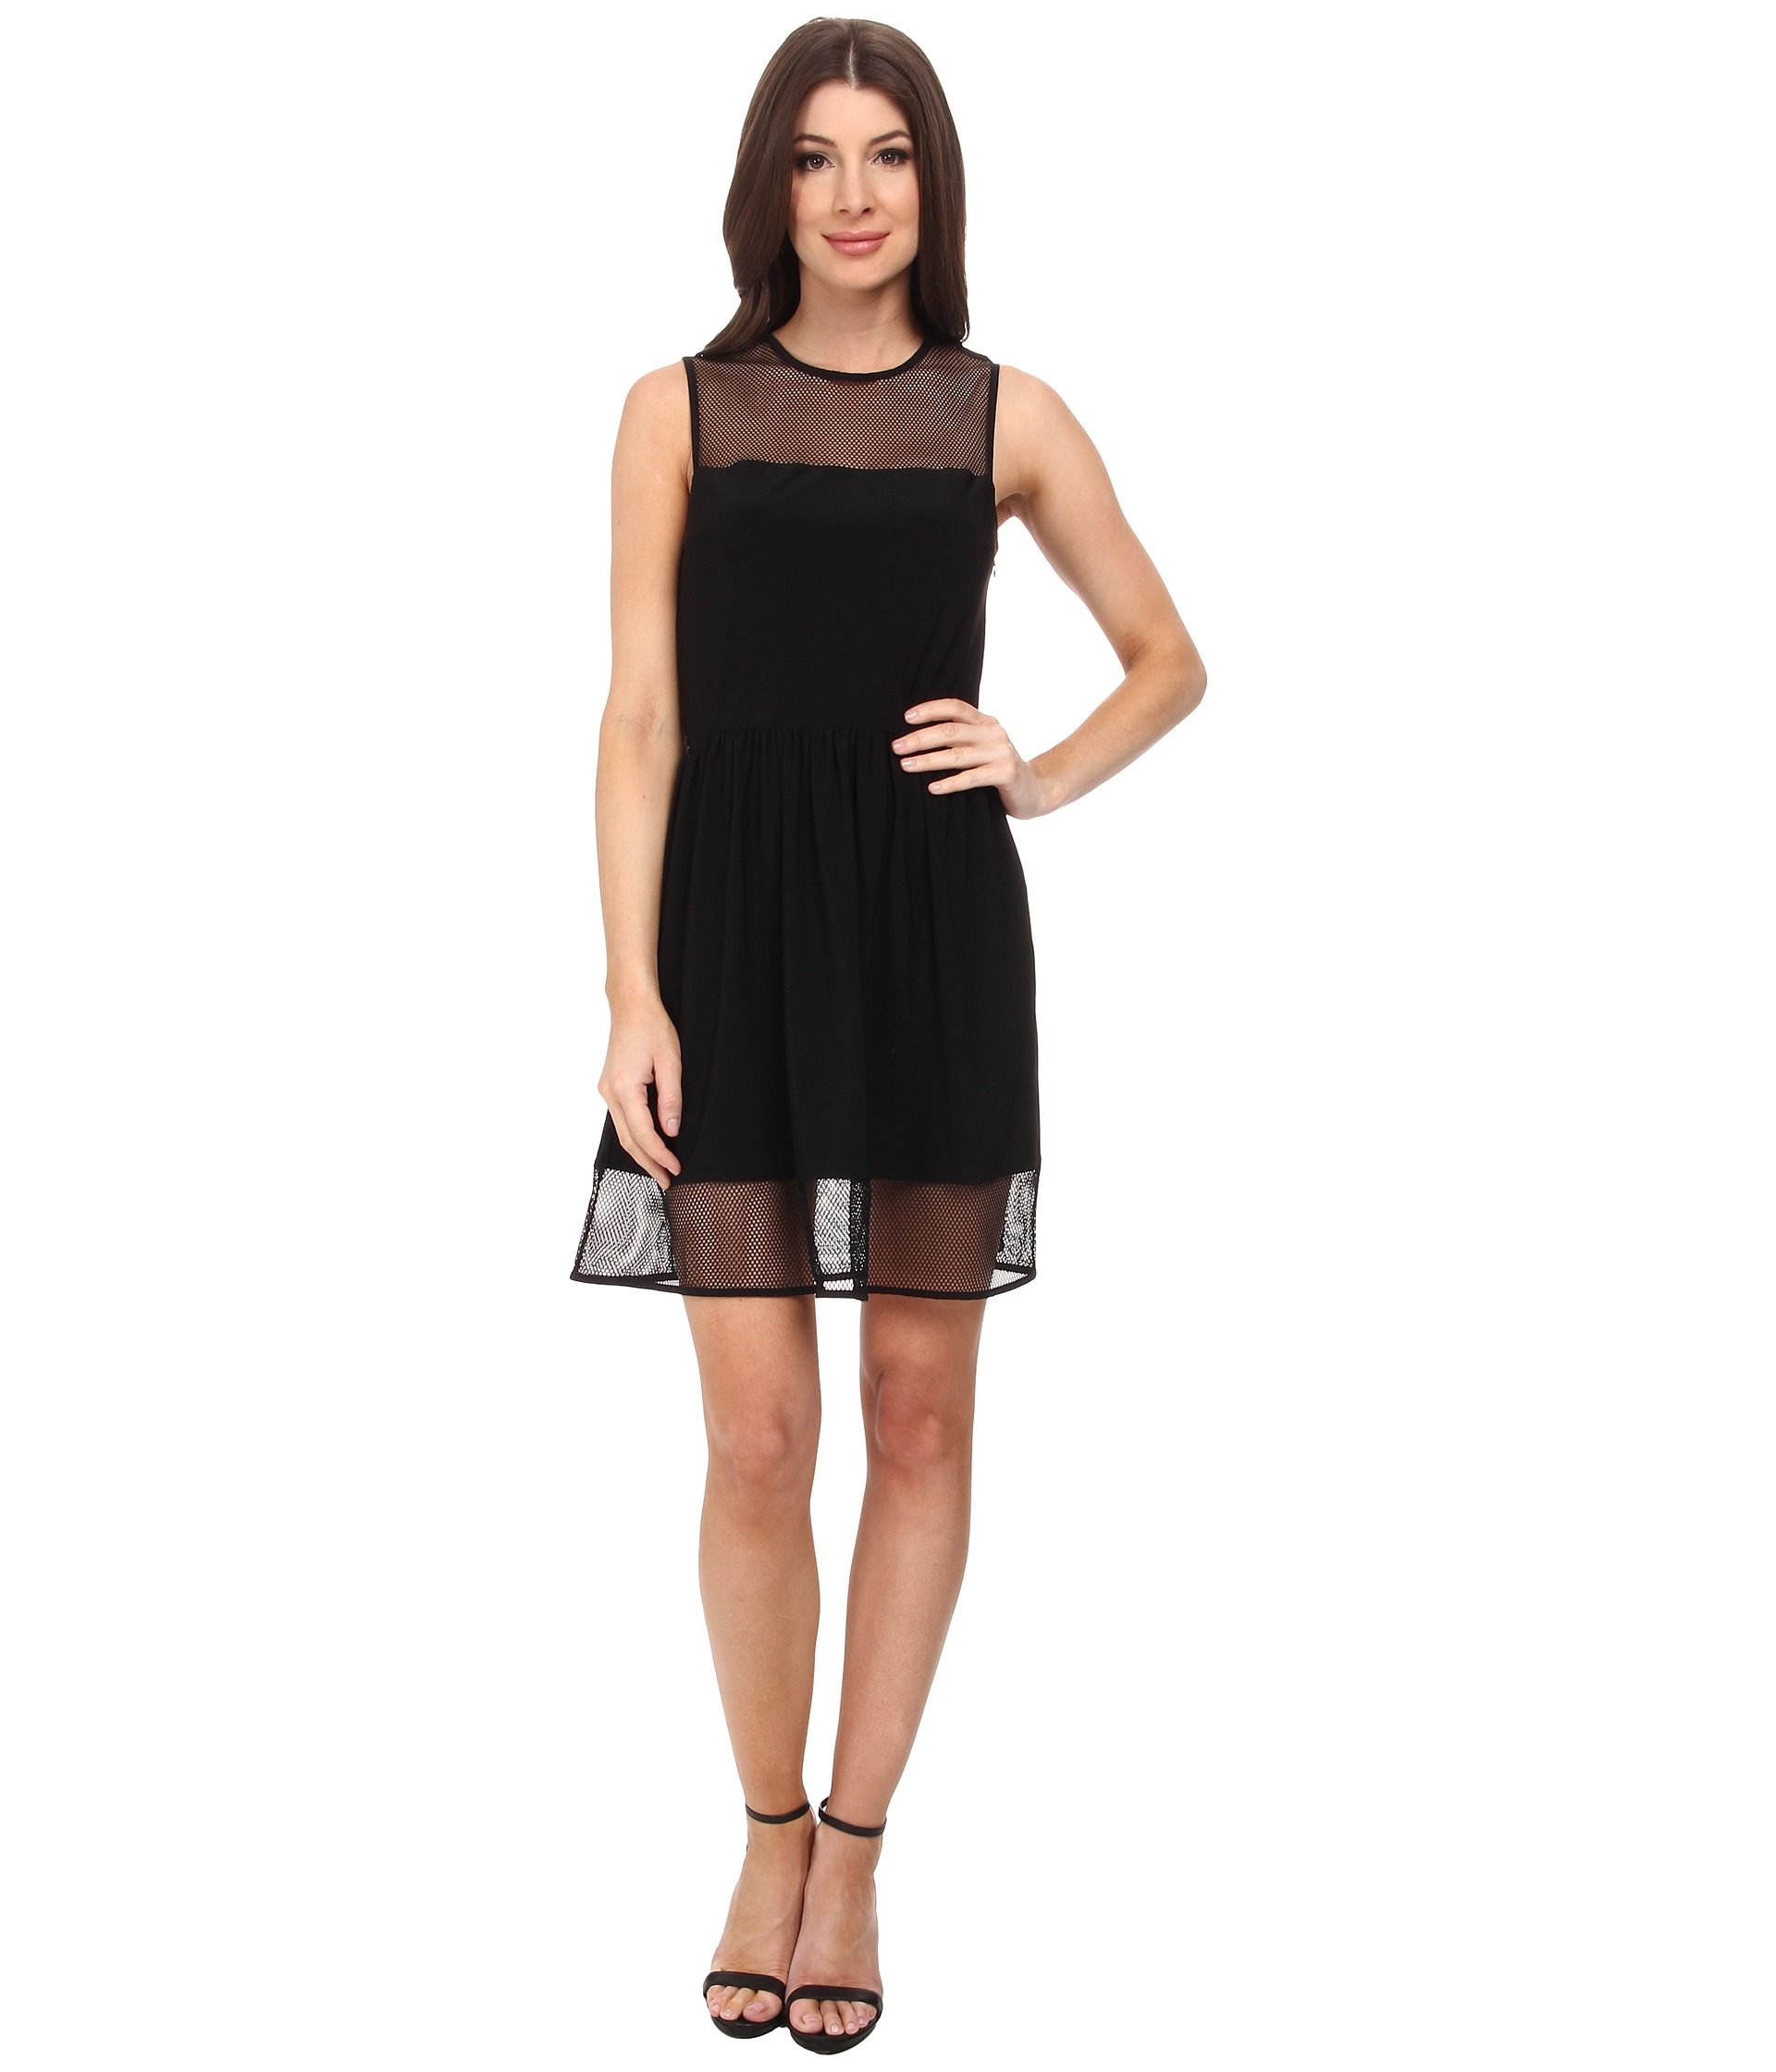 30284b7ca65 Lyst - Susana Monaco Lydia Dress in Black